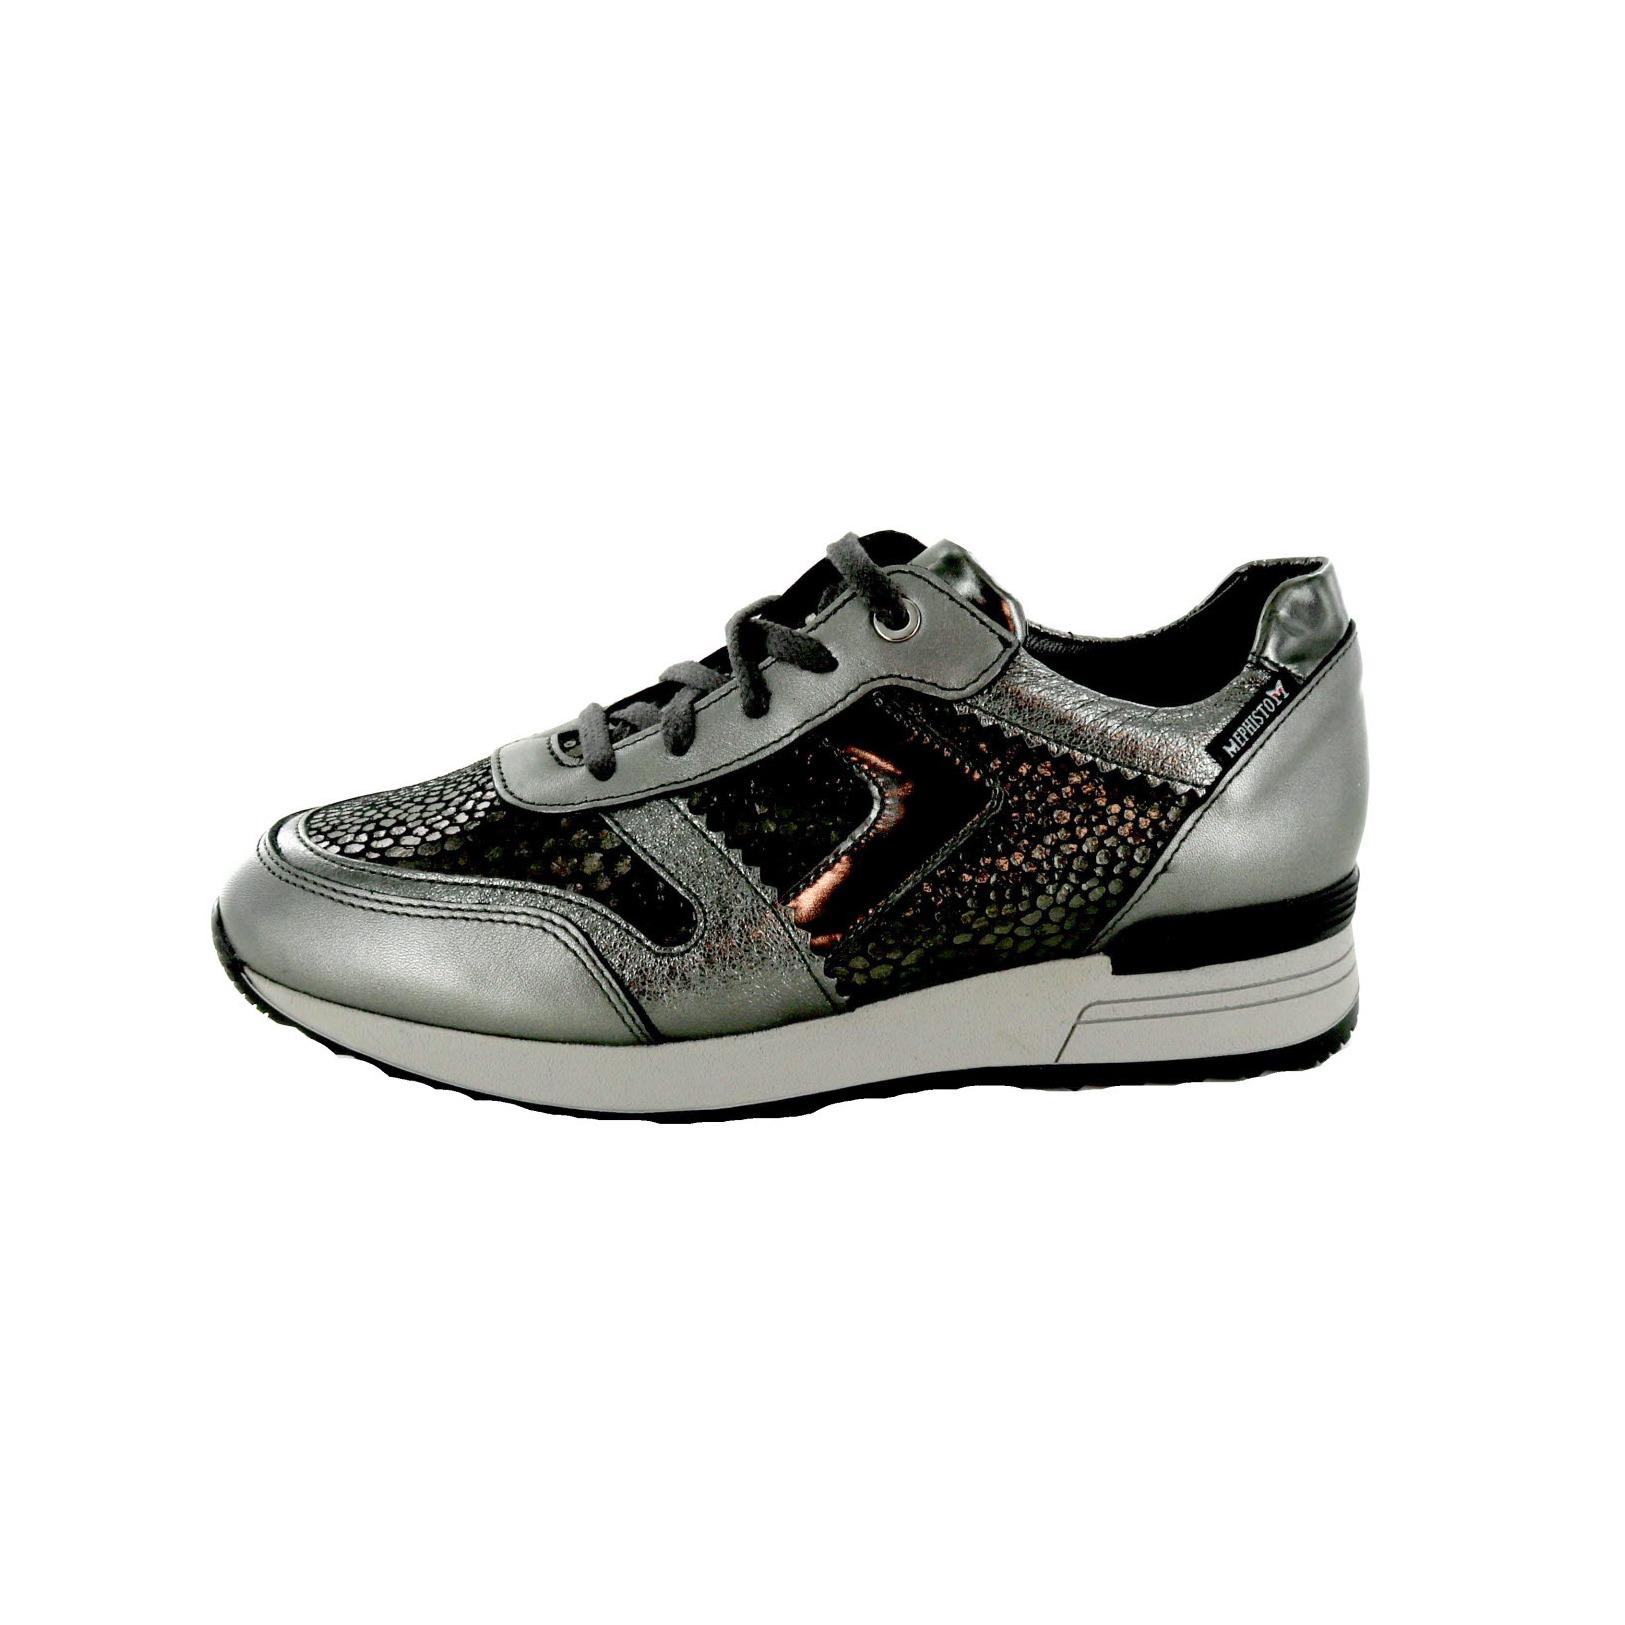 Chaussures Mephisto / Dentelle - Chaussures De Sport, Gris